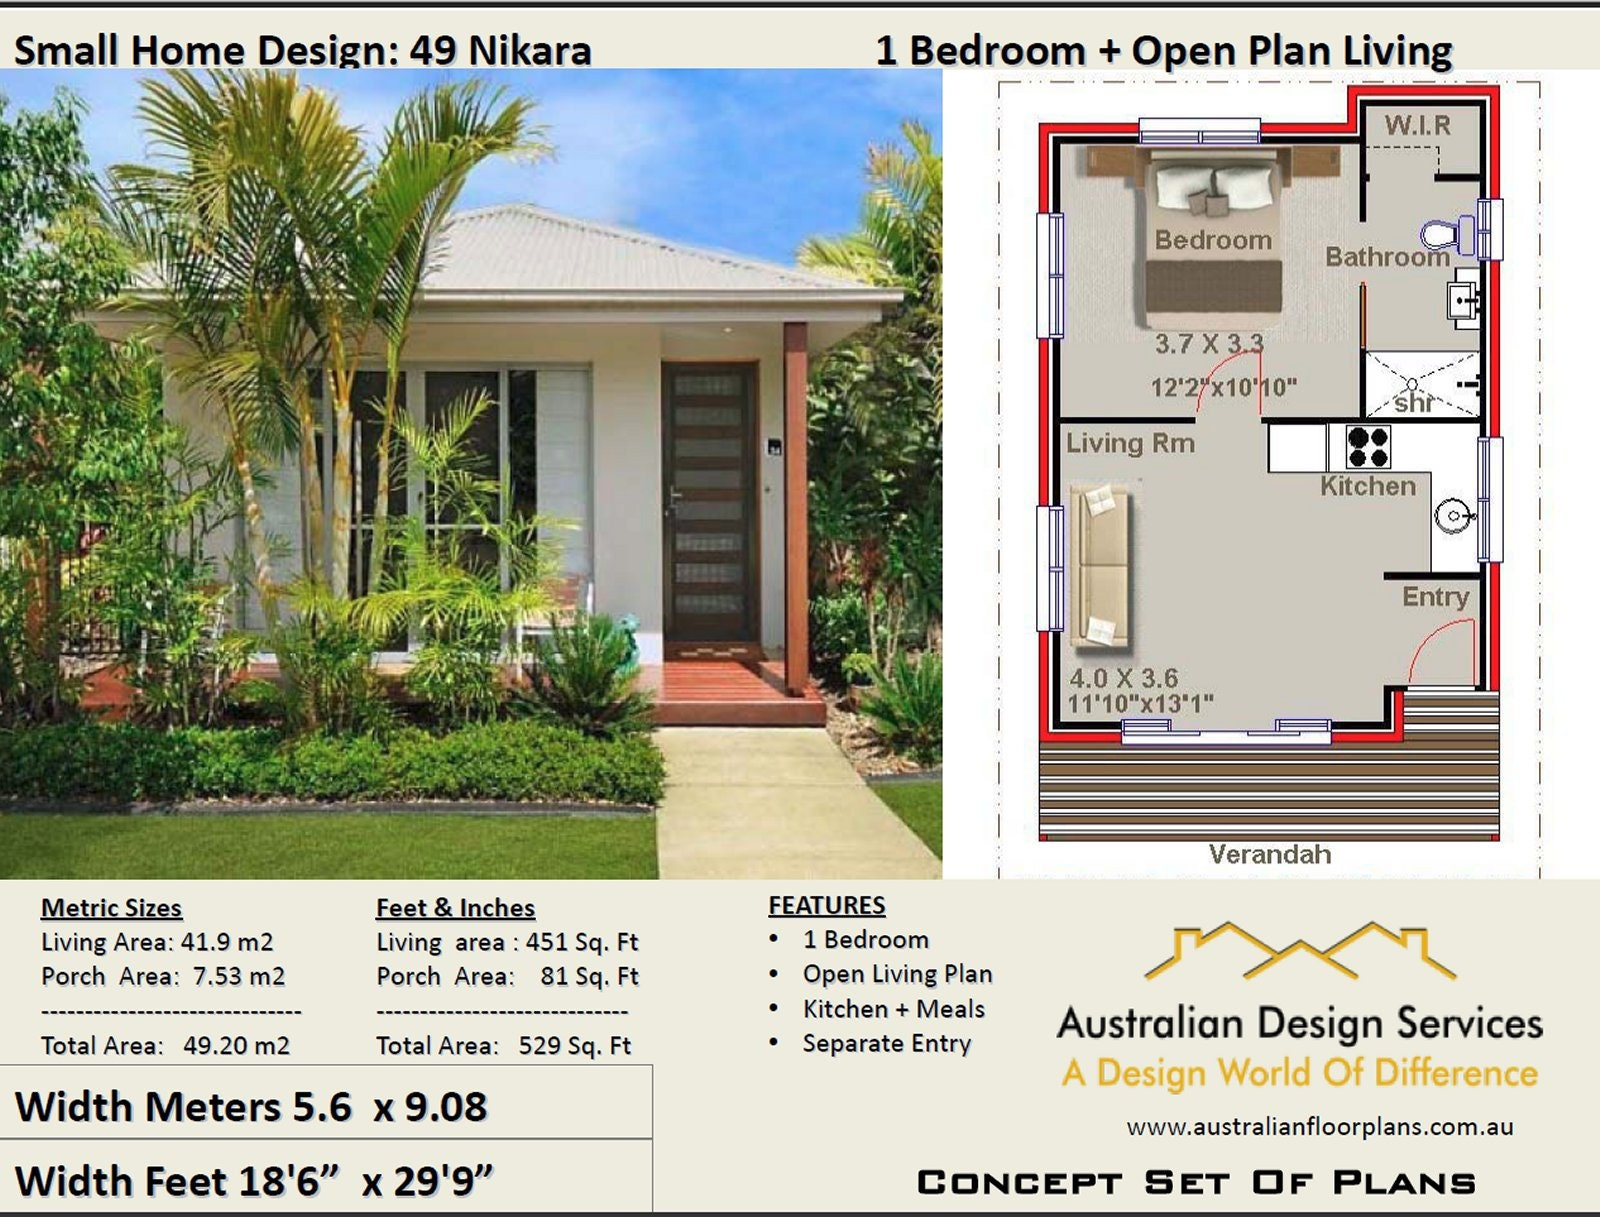 Small House Plan 49 Nikara 529 Sq Foot 49 2 M2 1 Bedroom Etsy